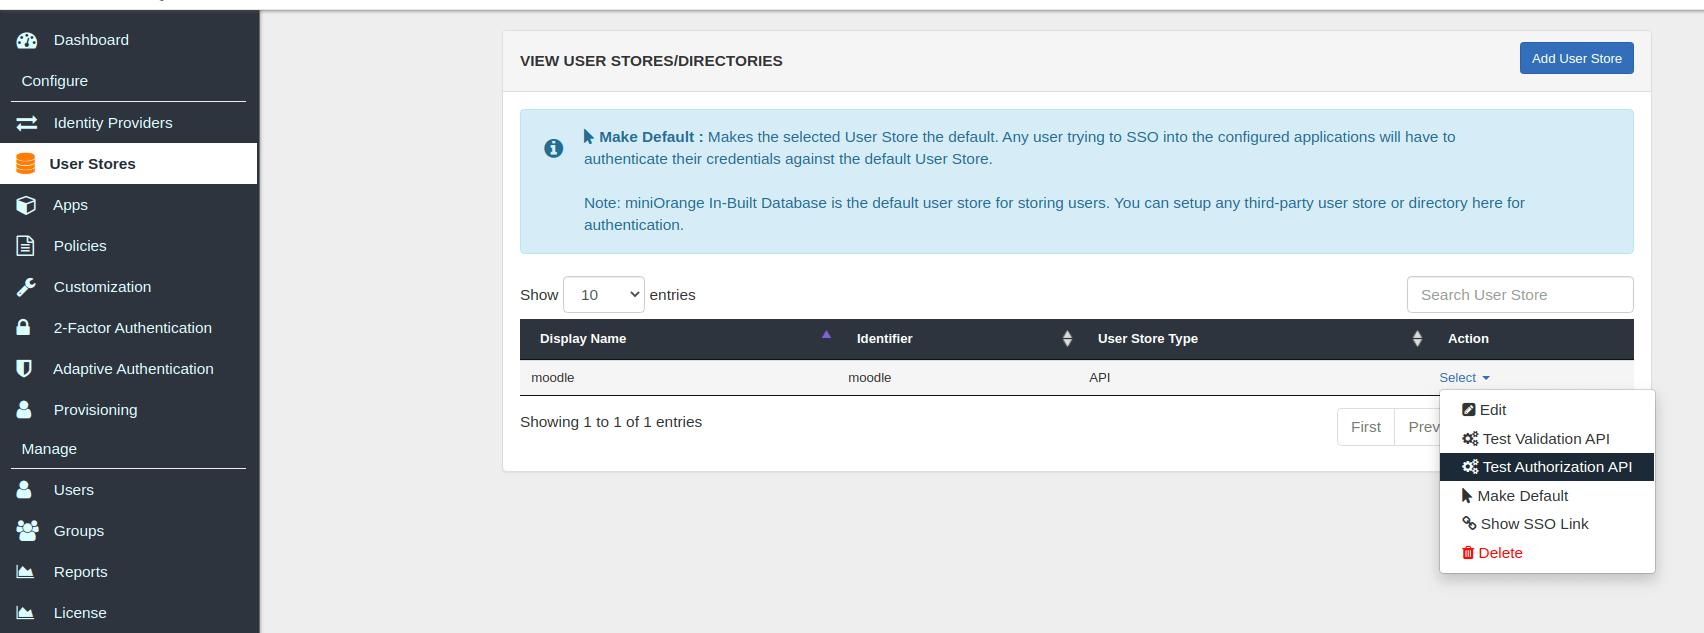 Test authorization api for Moodle SSO login